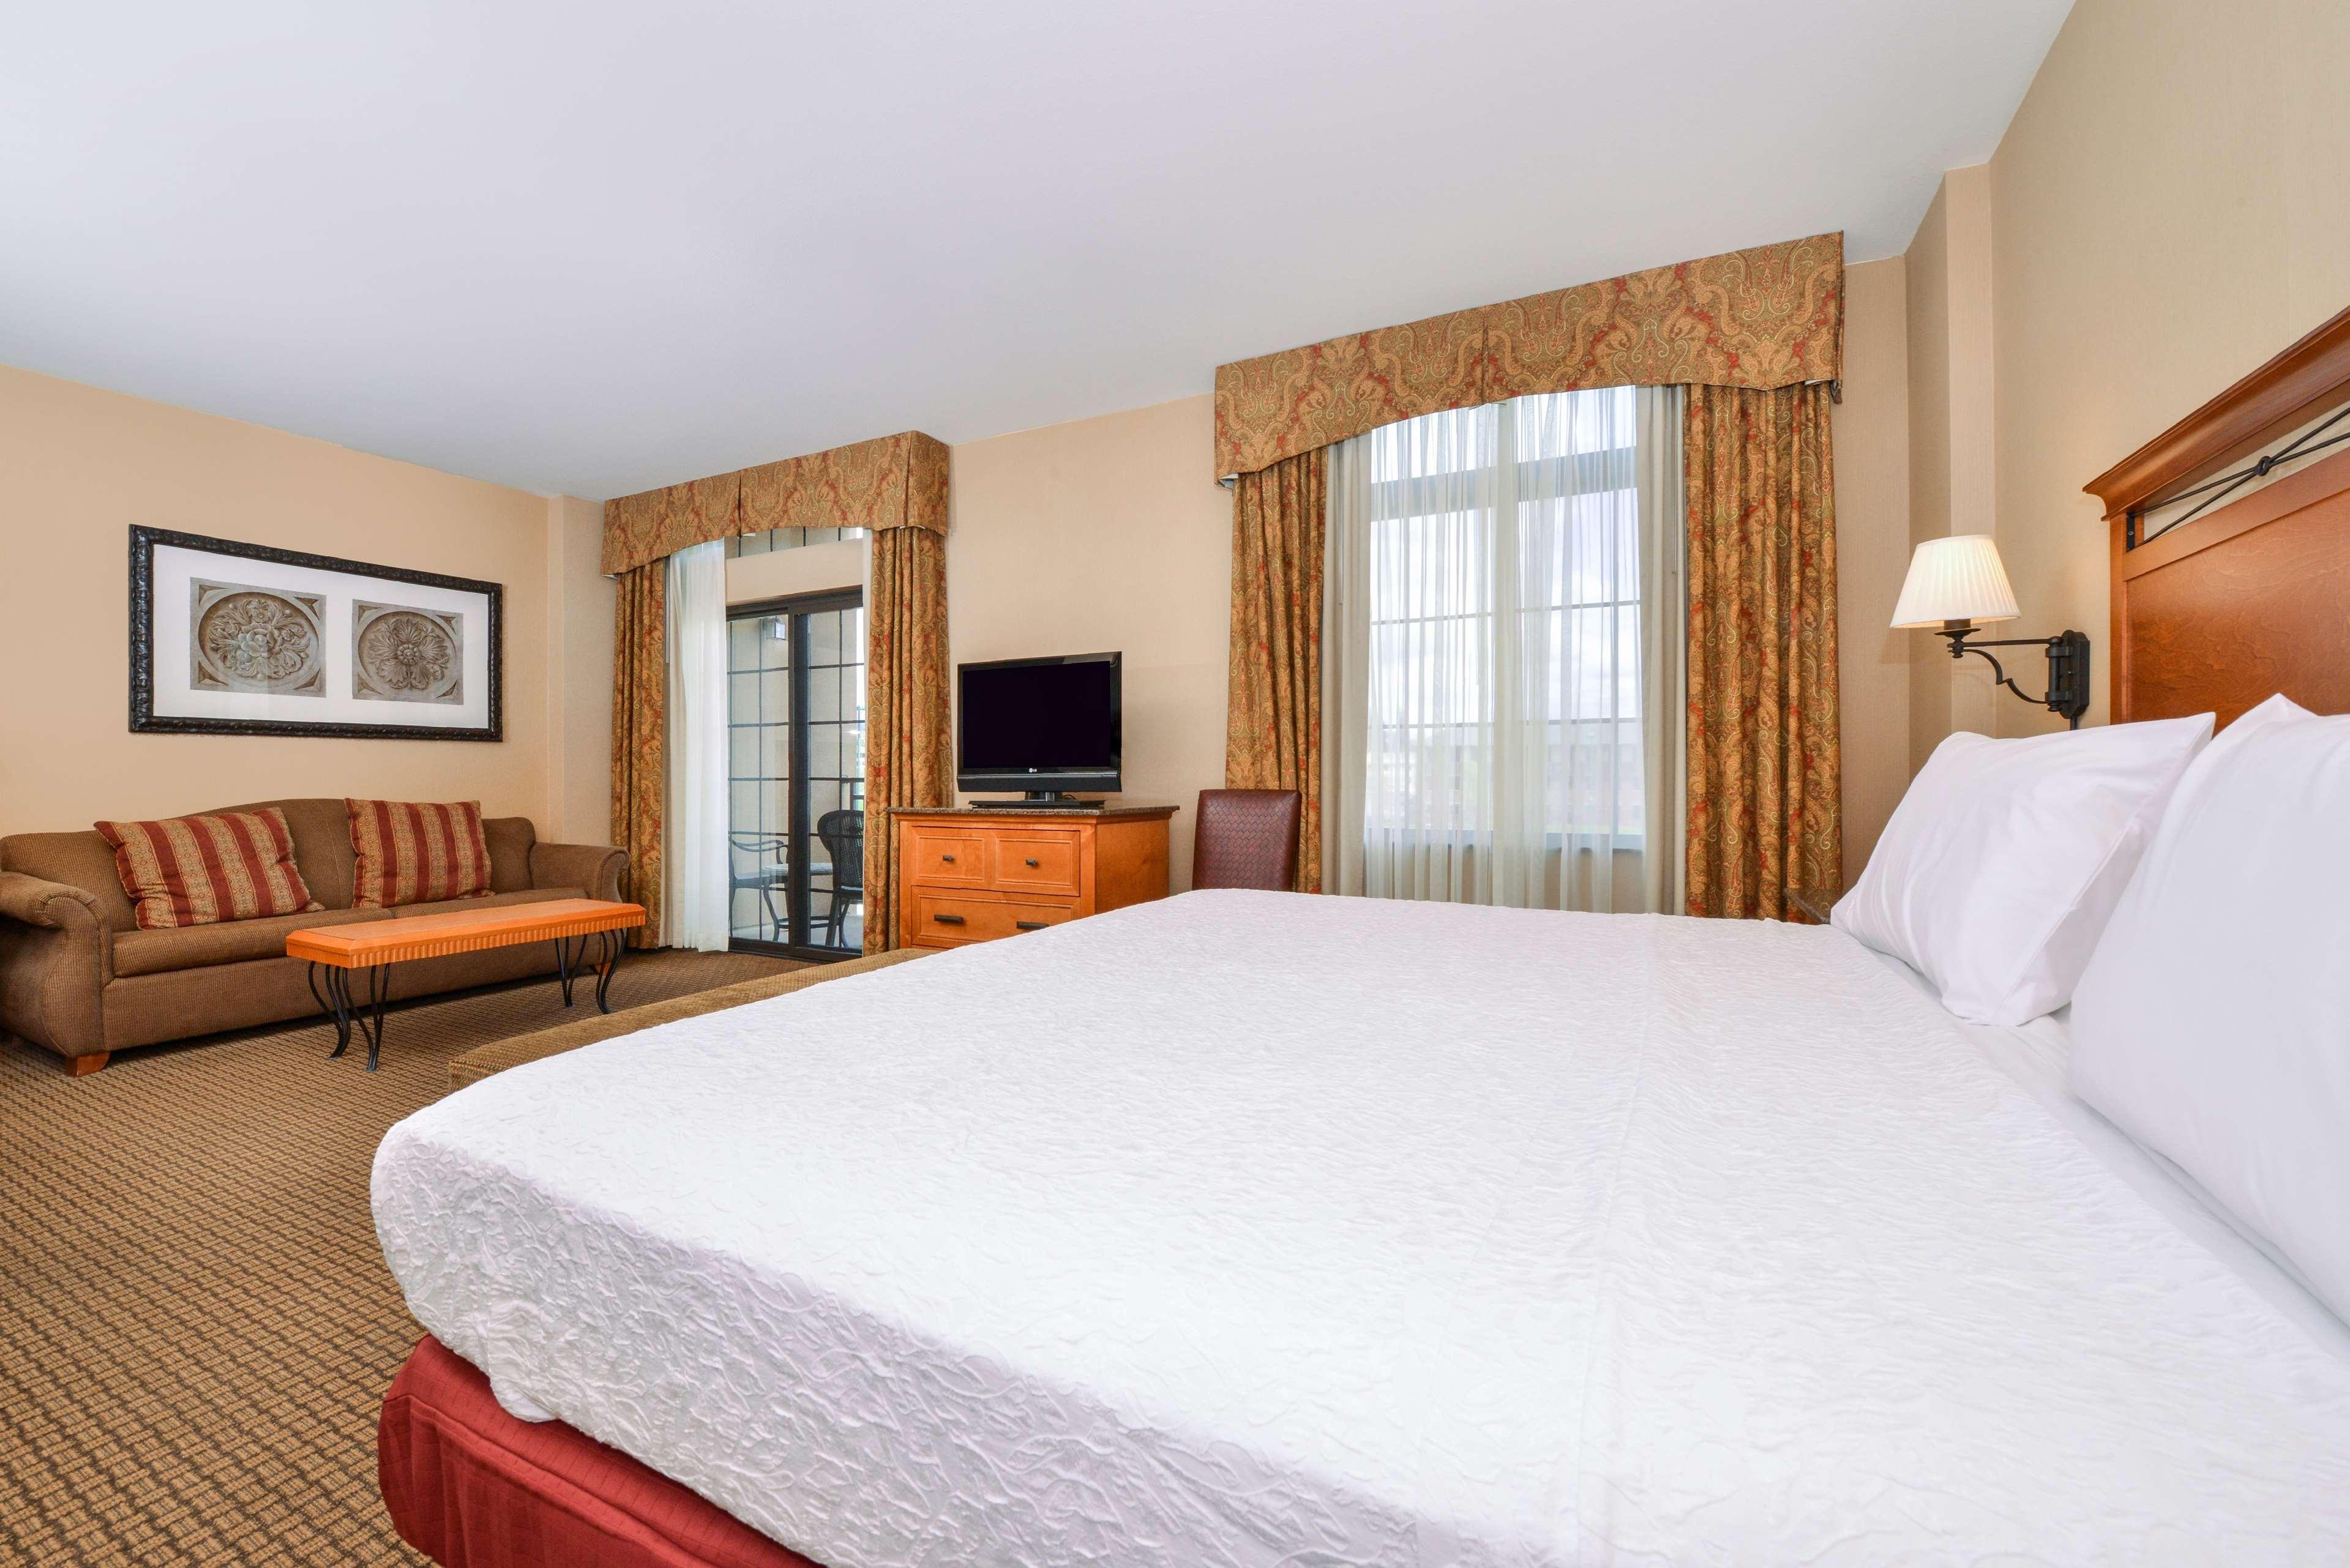 Hampton Inn & Suites Coeur d' Alene image 21